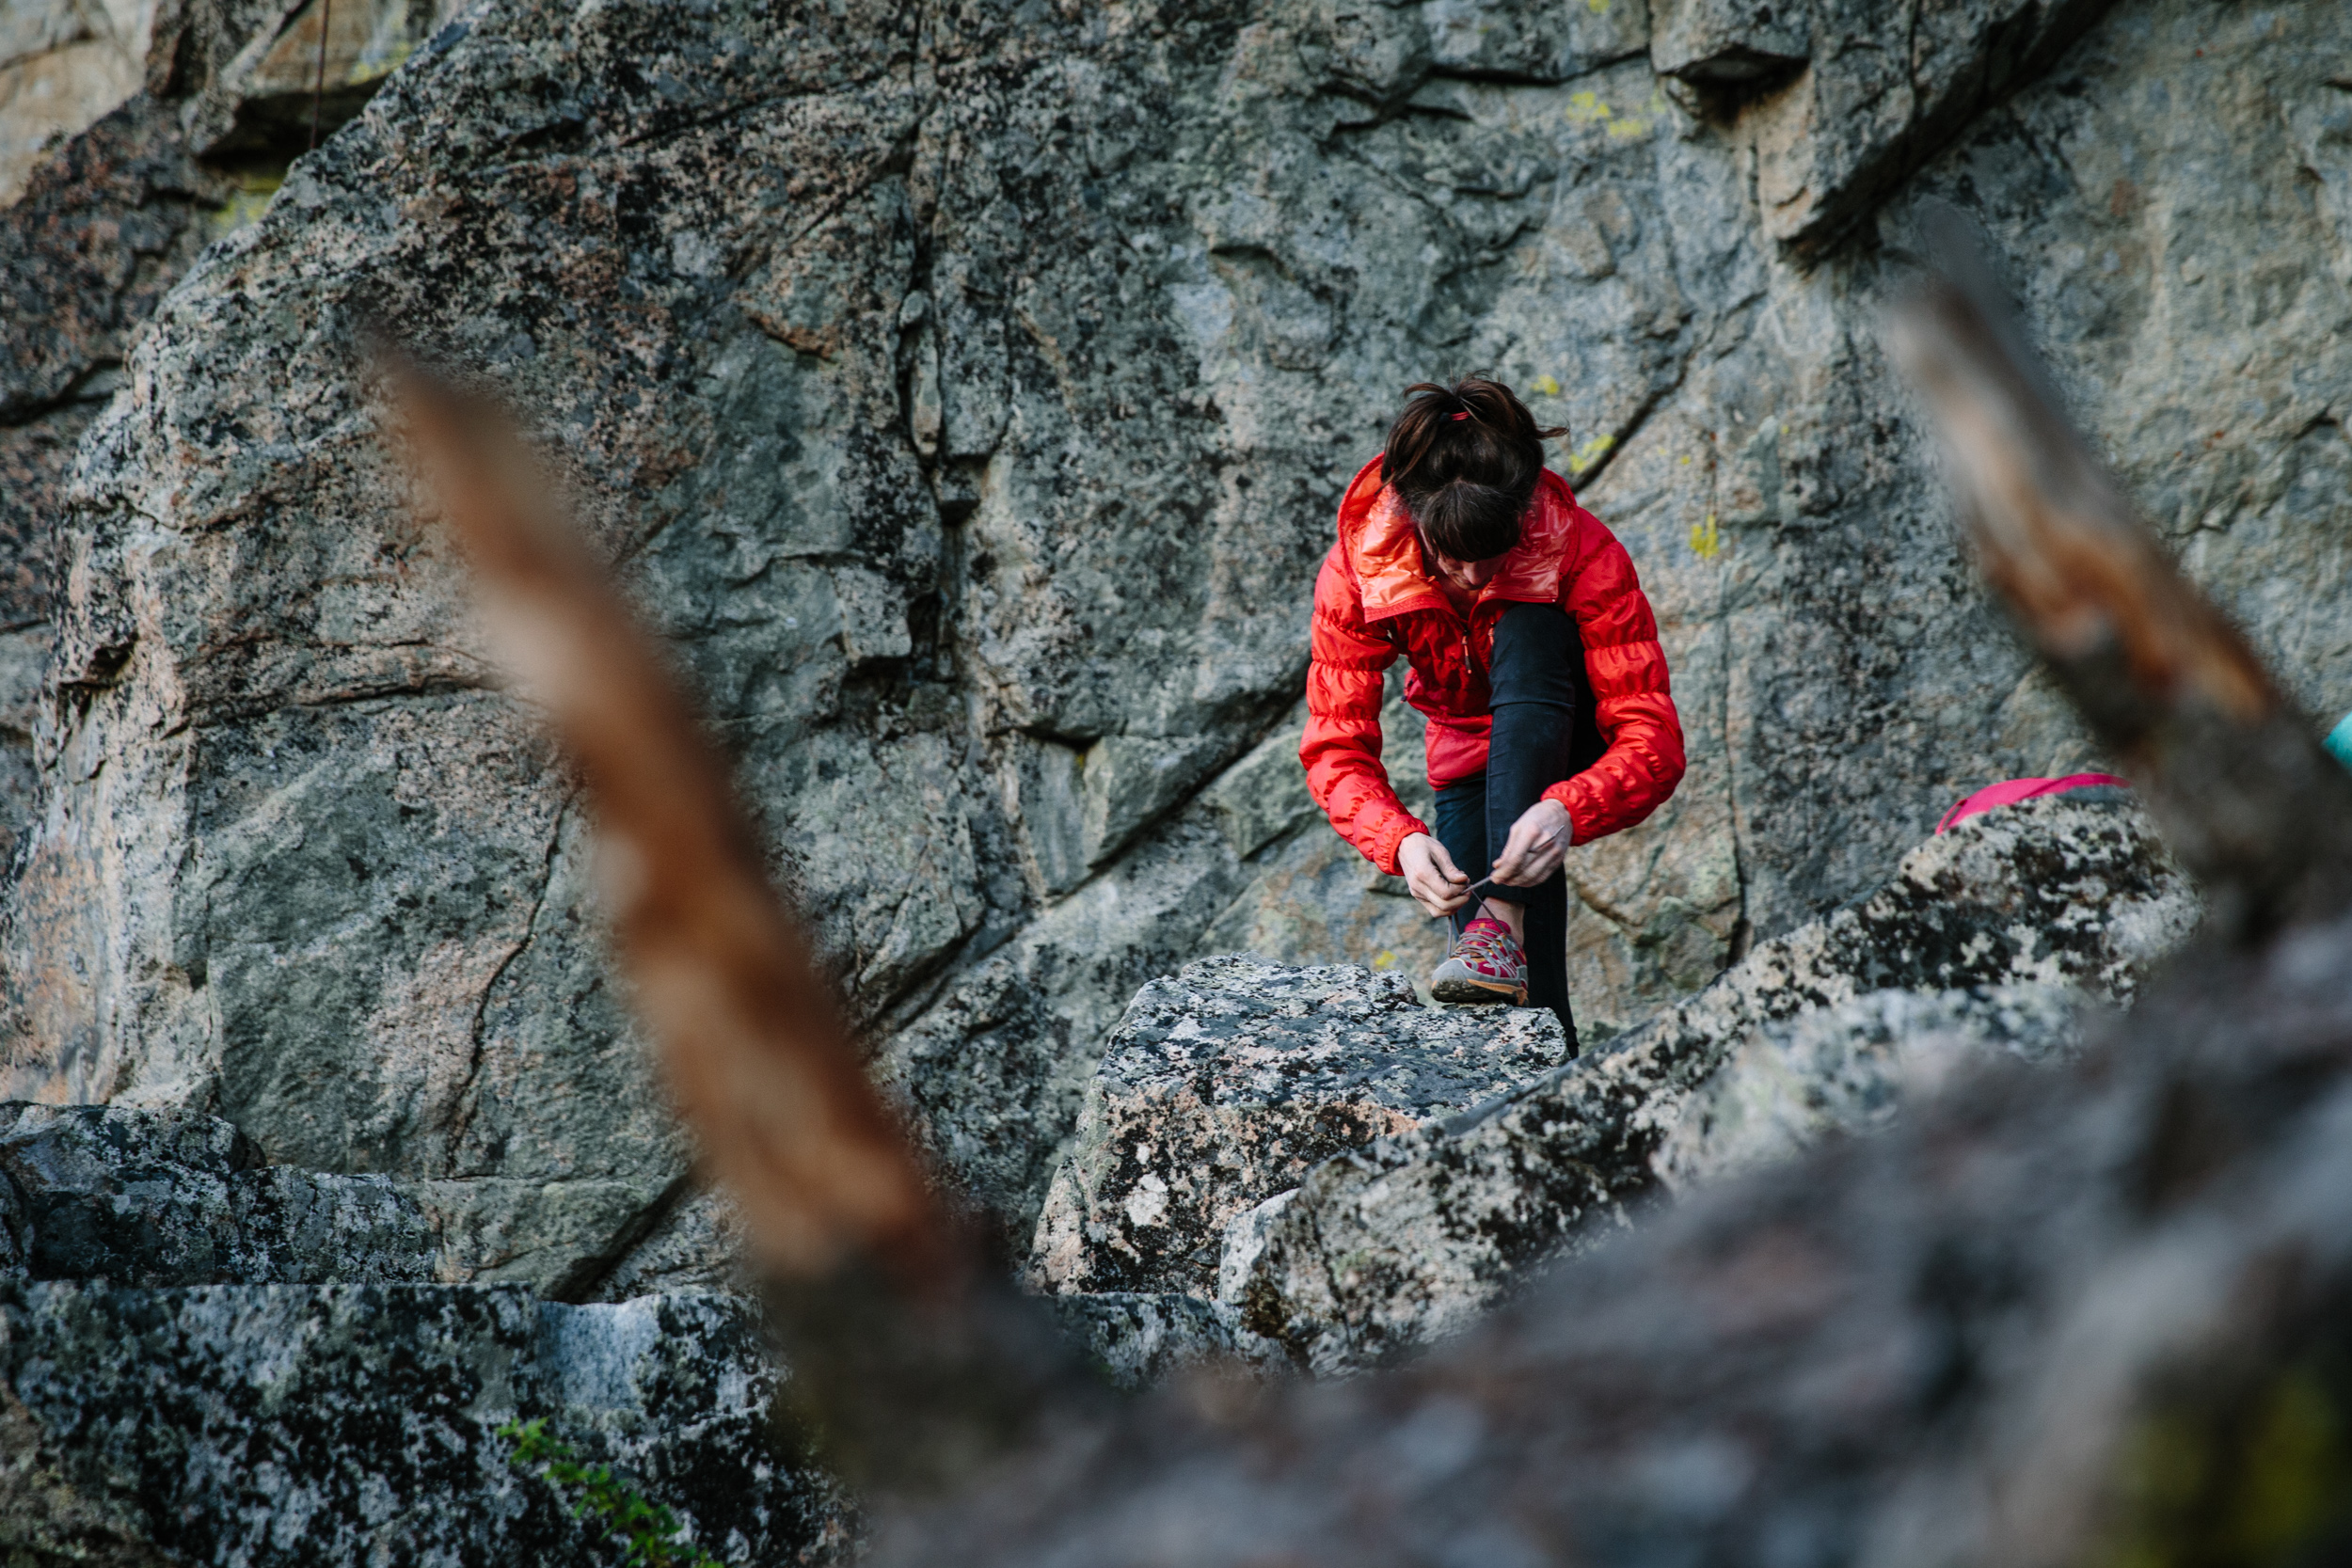 31robb-thompson-skaha-climbing-sarah-leanne-hart-.jpg